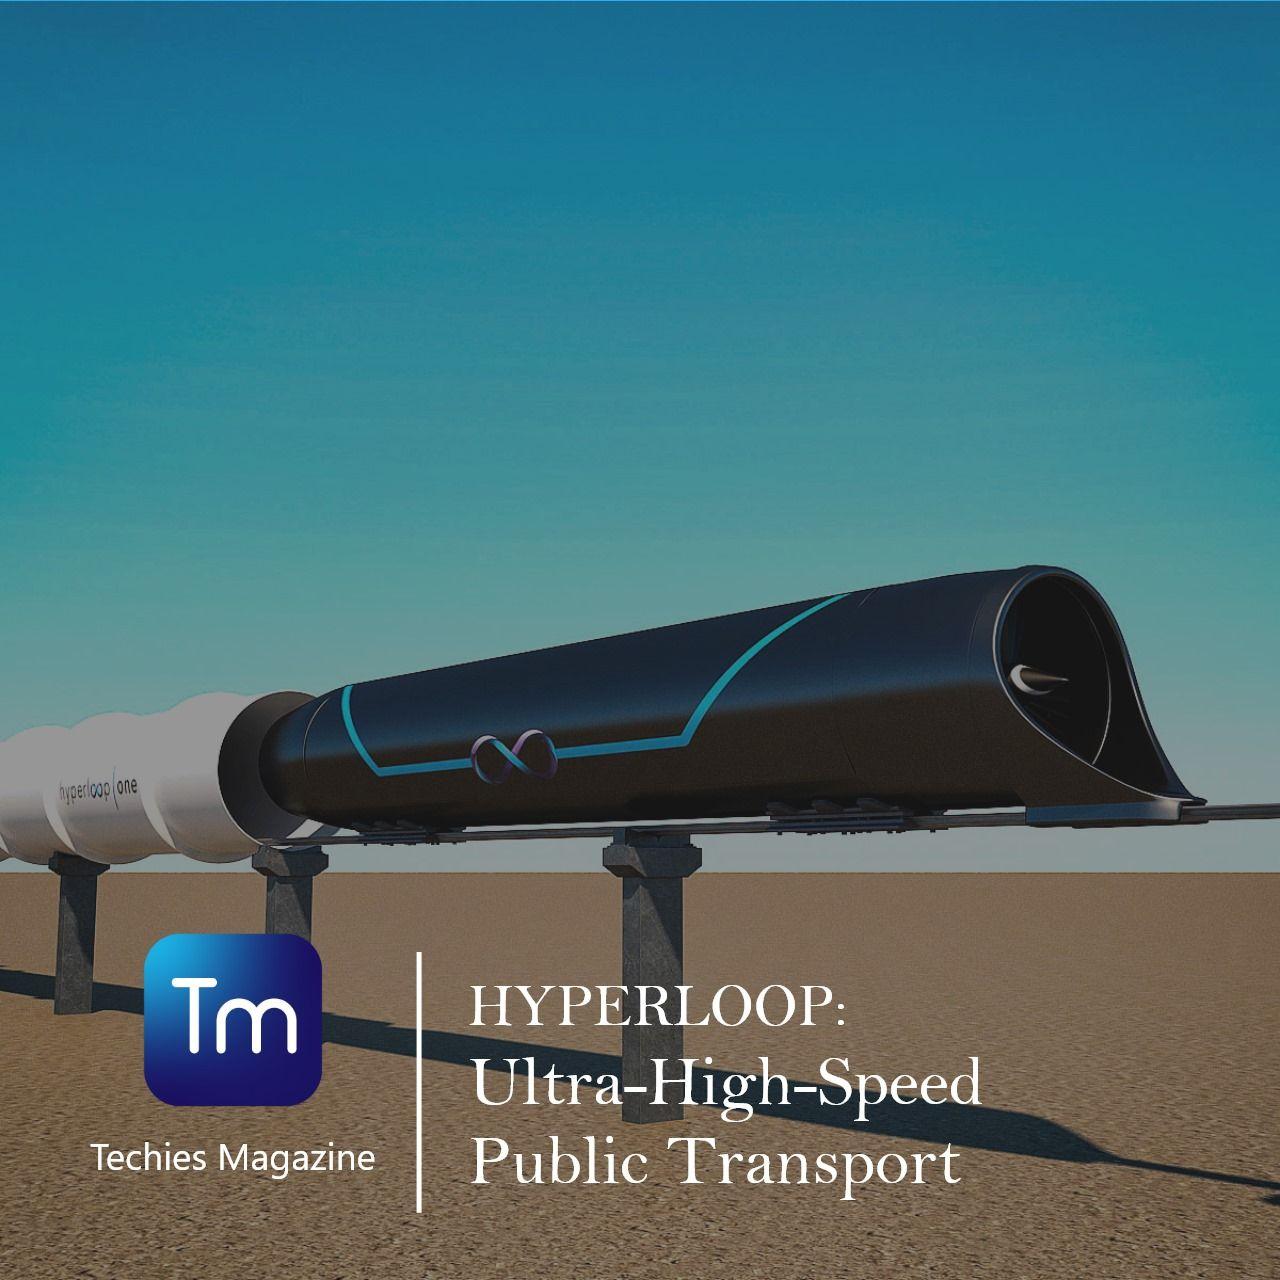 Hyperloop Ultra High Speed Public Tranpotation In 2020 Public Transport Propulsion Transportation